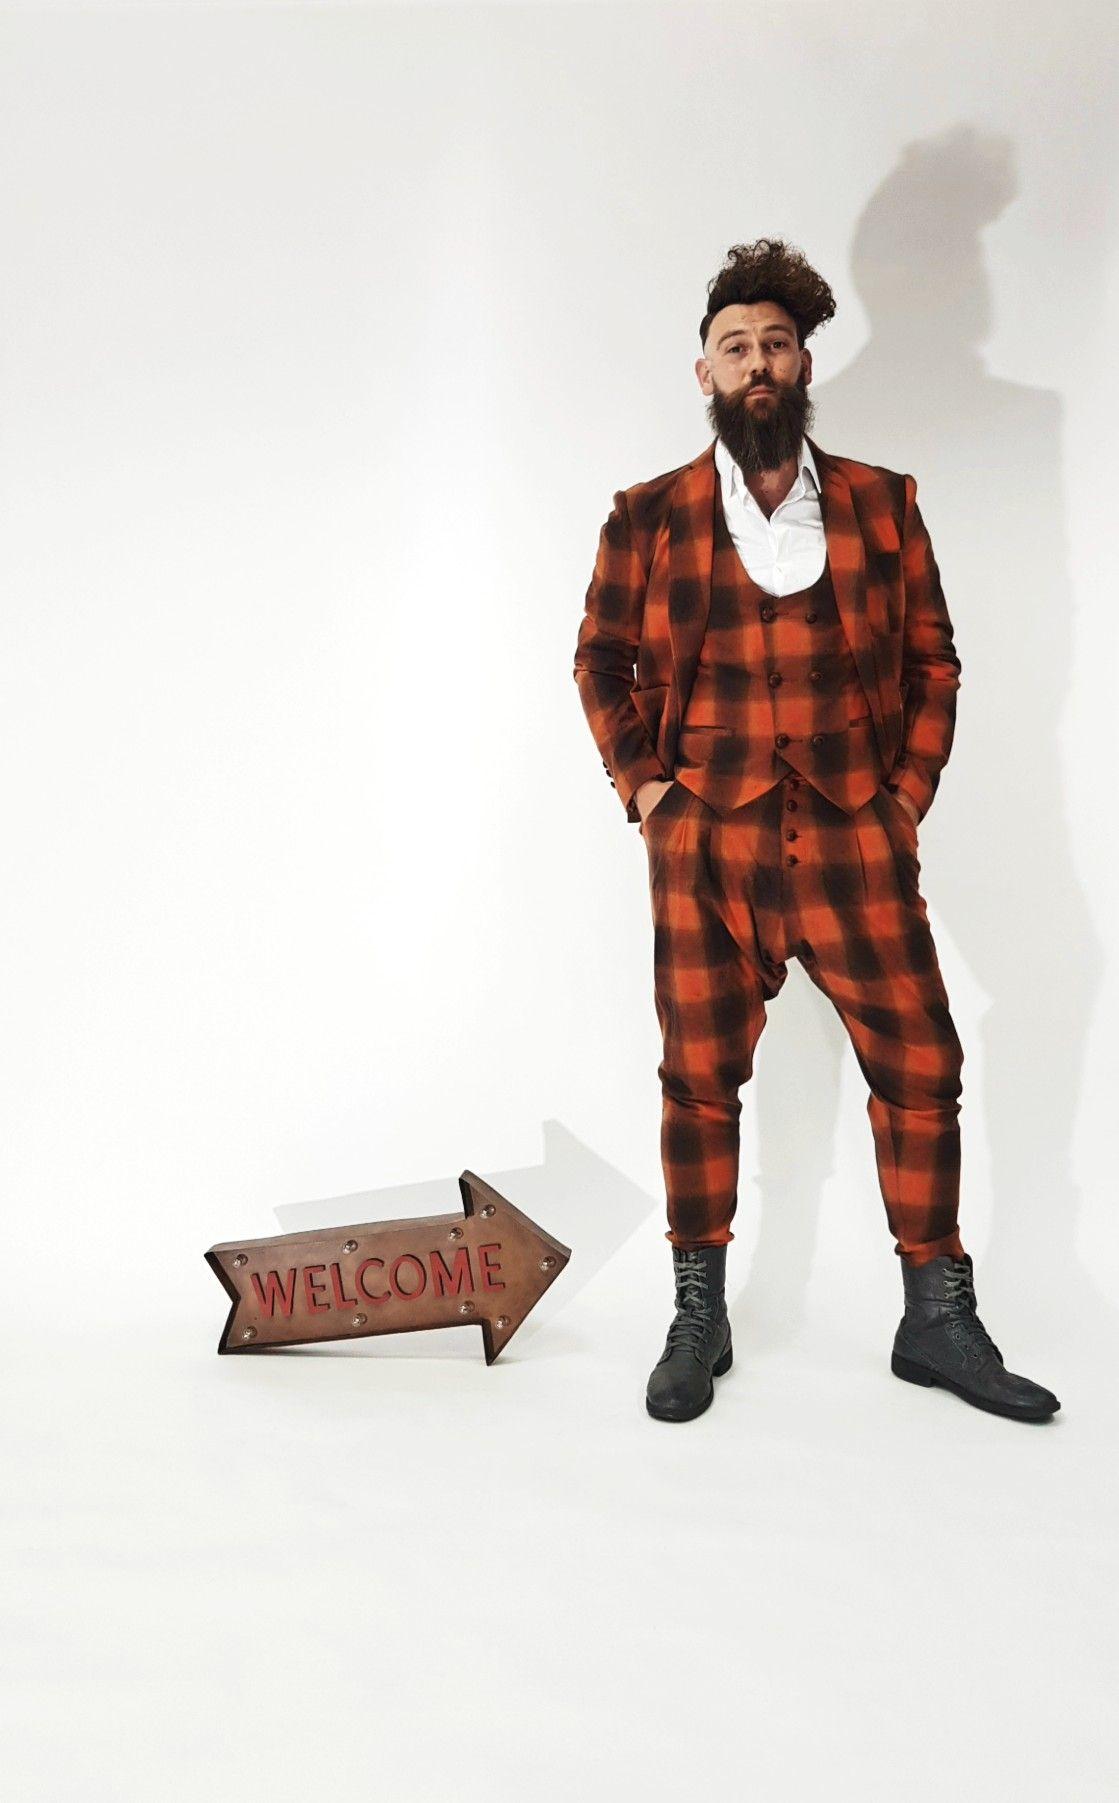 bc0e54990456 Barber clothing,kirios,artist, suit | KIRIOS | Barber clothing, Mens ...